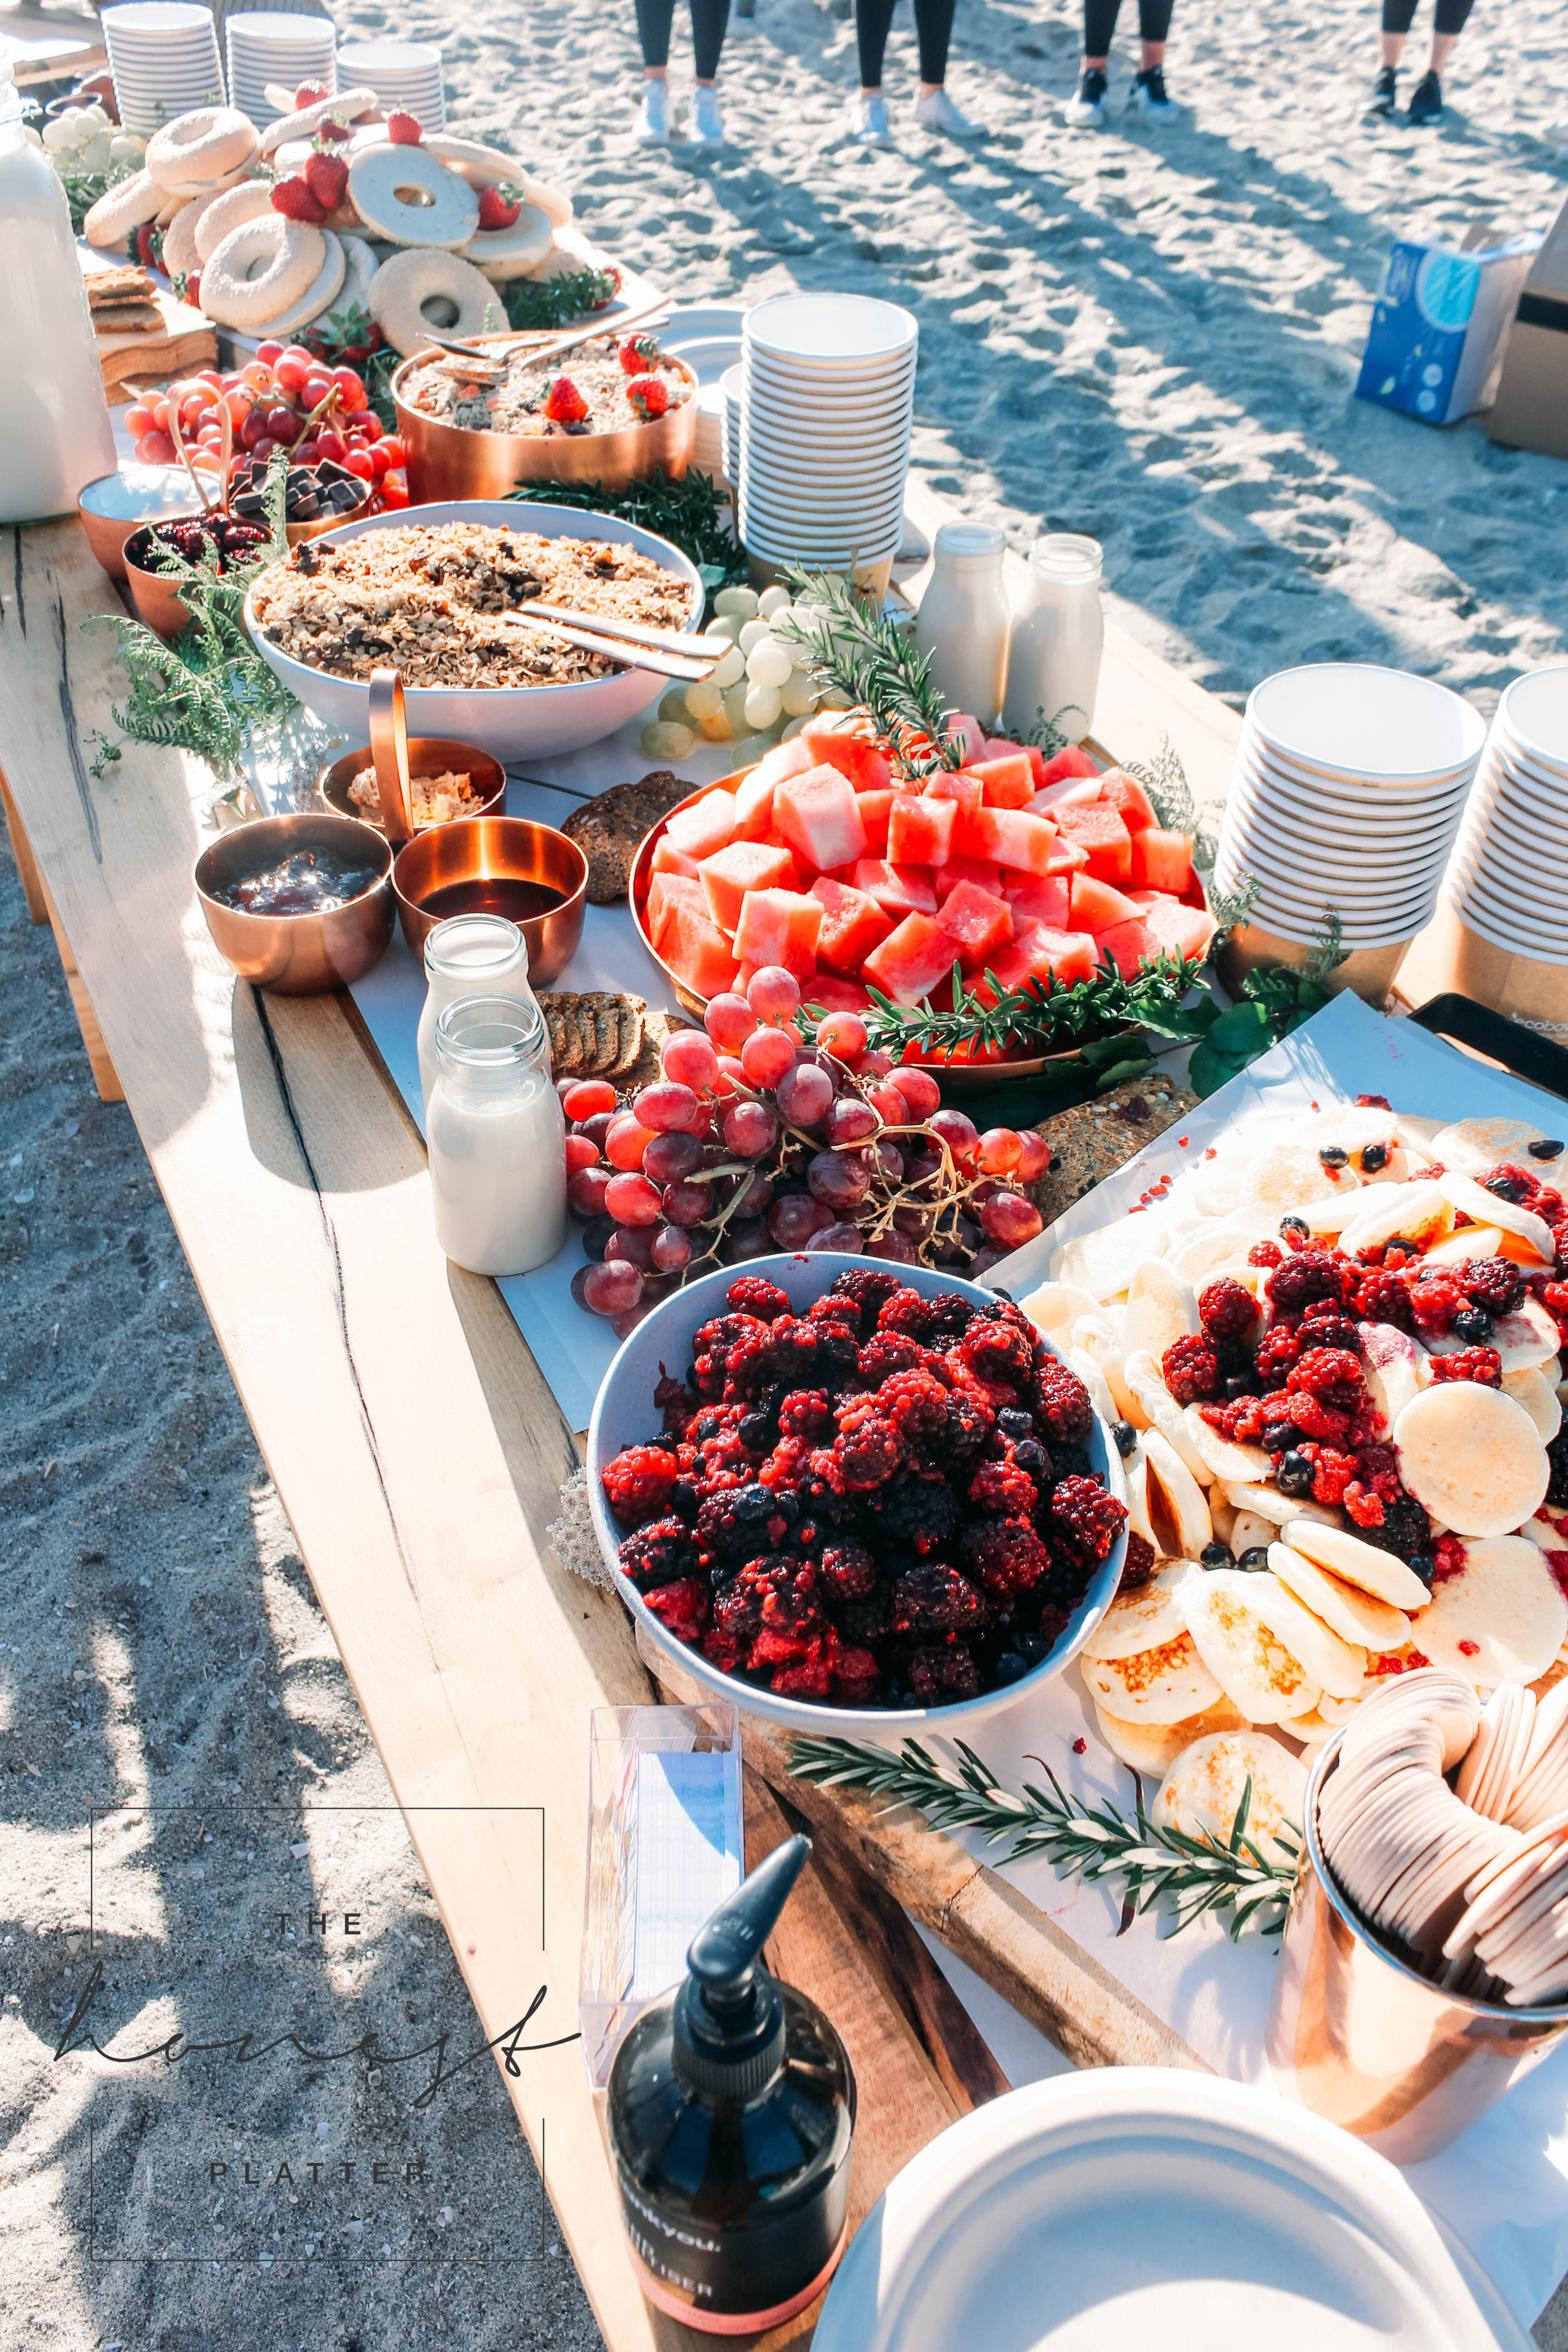 The Honest Platter Grazing Tables Platters Bay Of Plenty Coromandel Nz Grazing Tables Platters Beach Meals